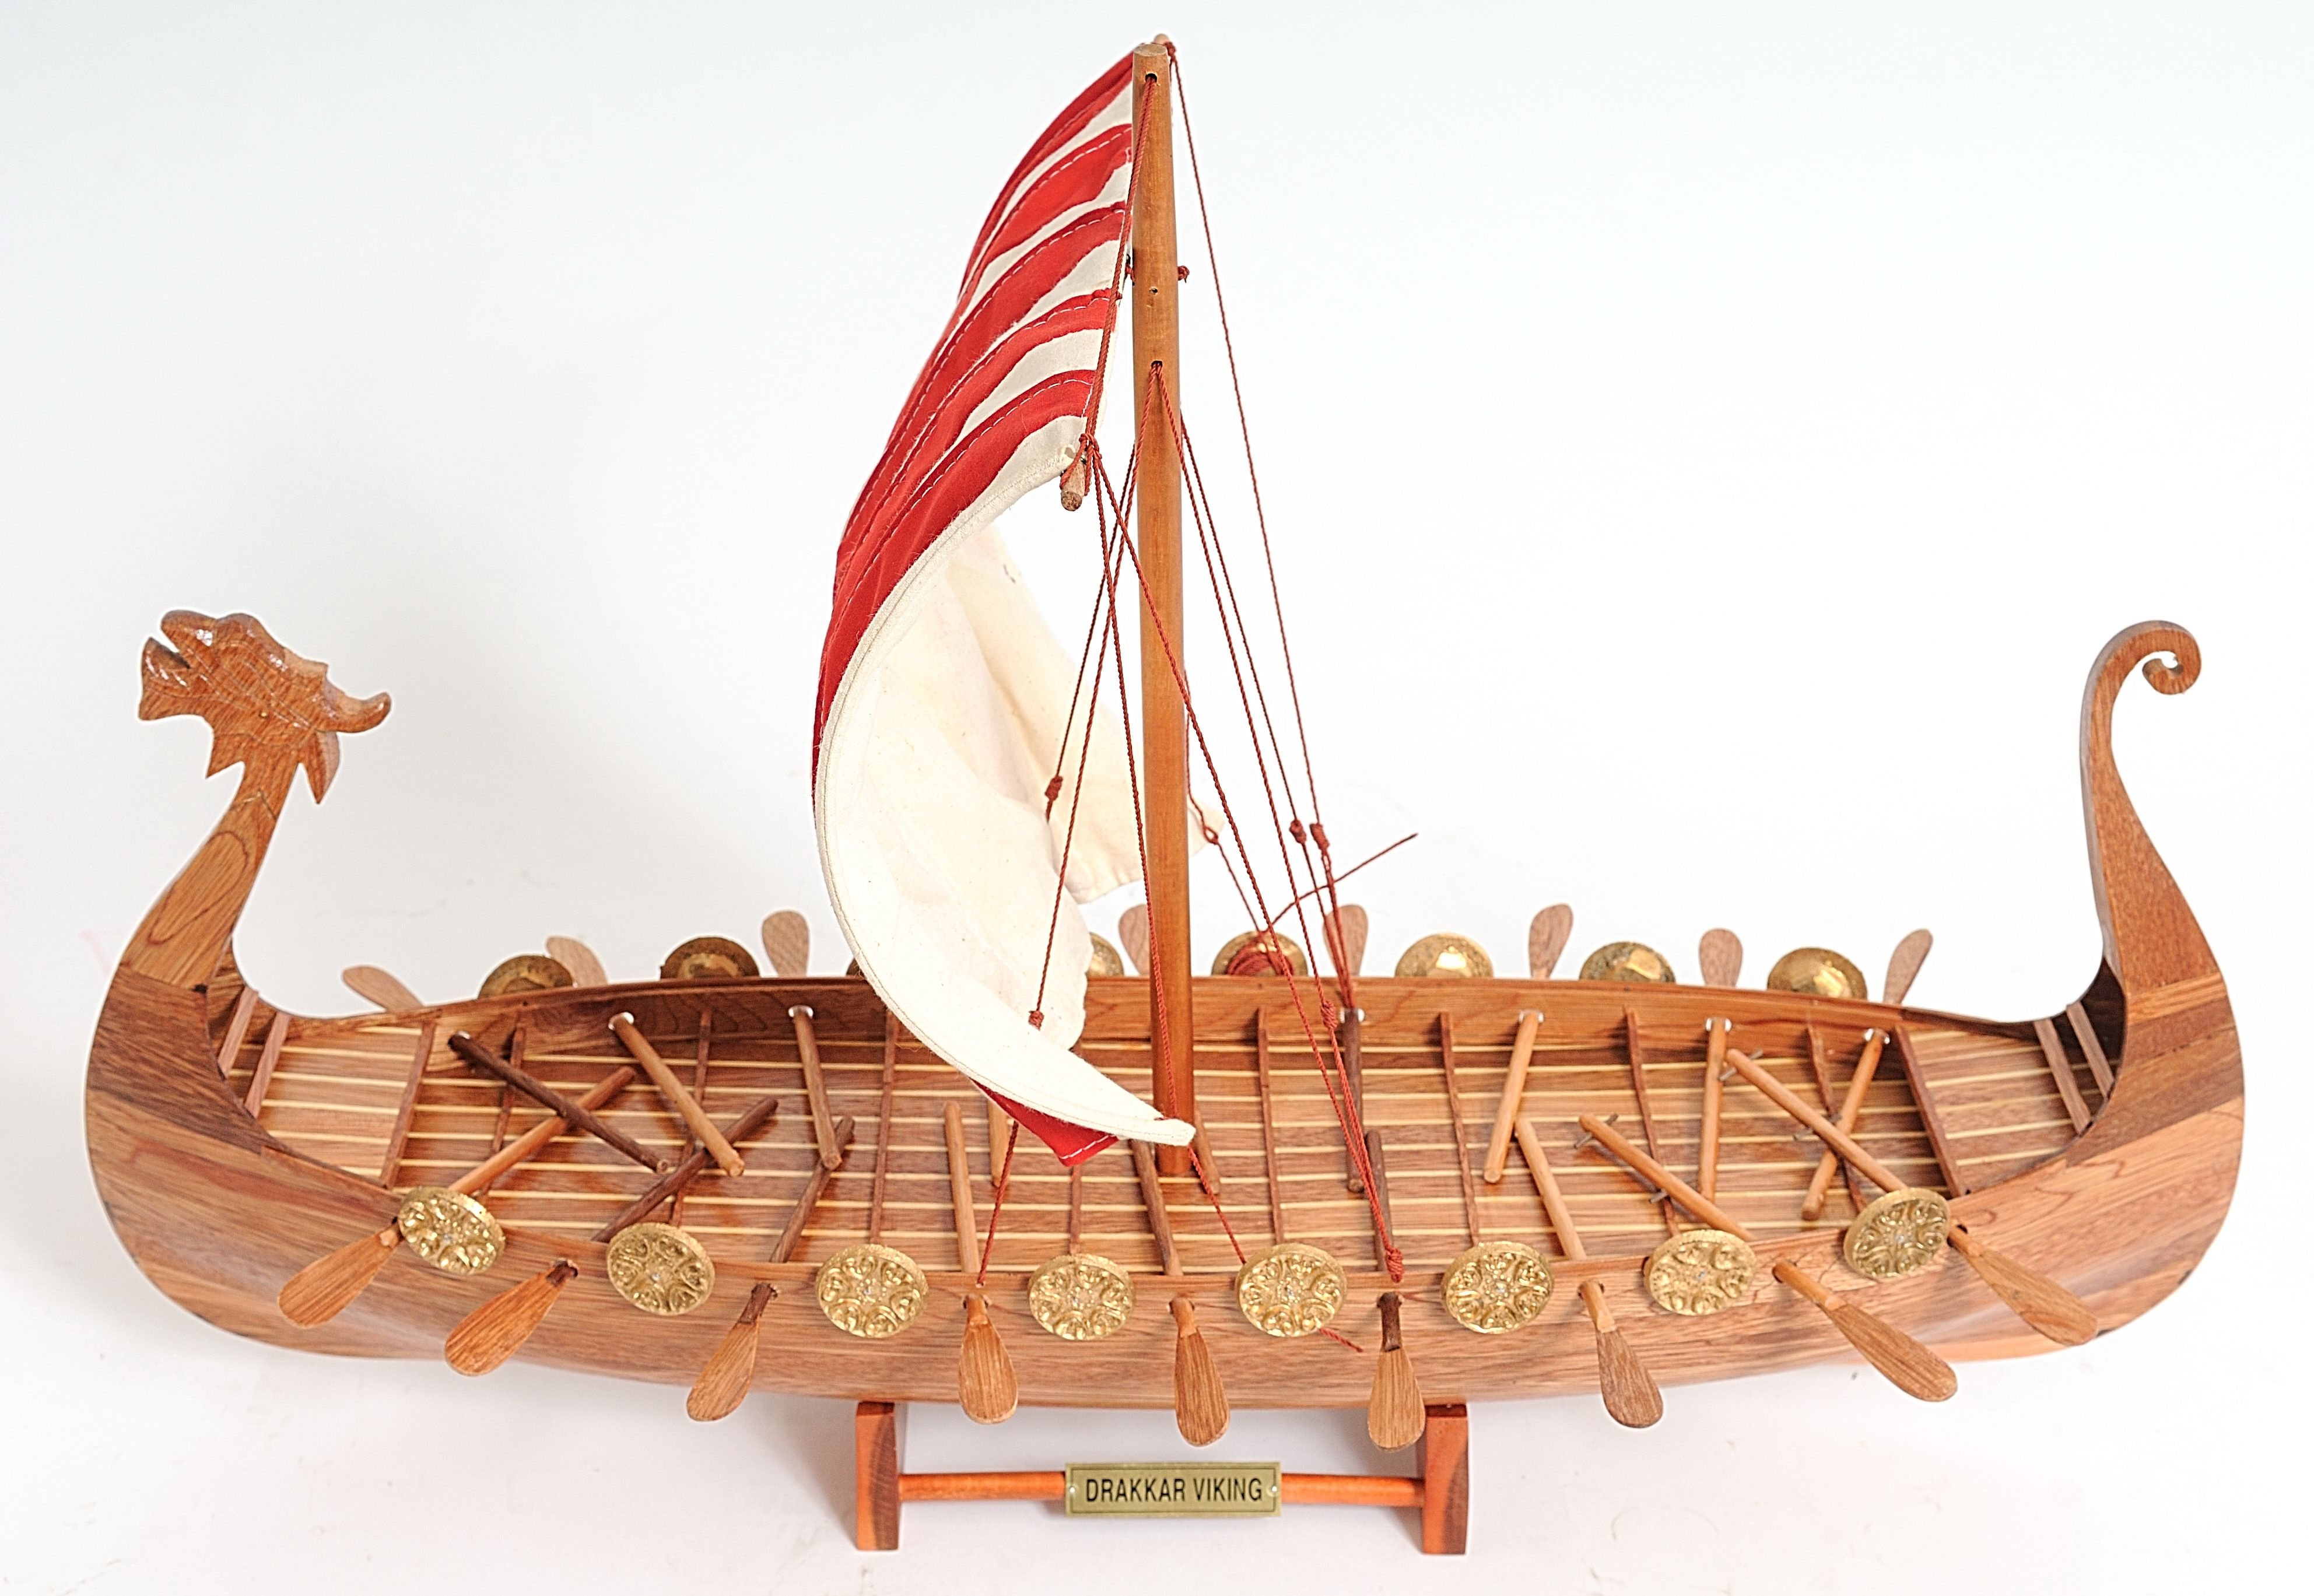 2237-13174-Drakkar-Viking-Wooden-Model-Ship